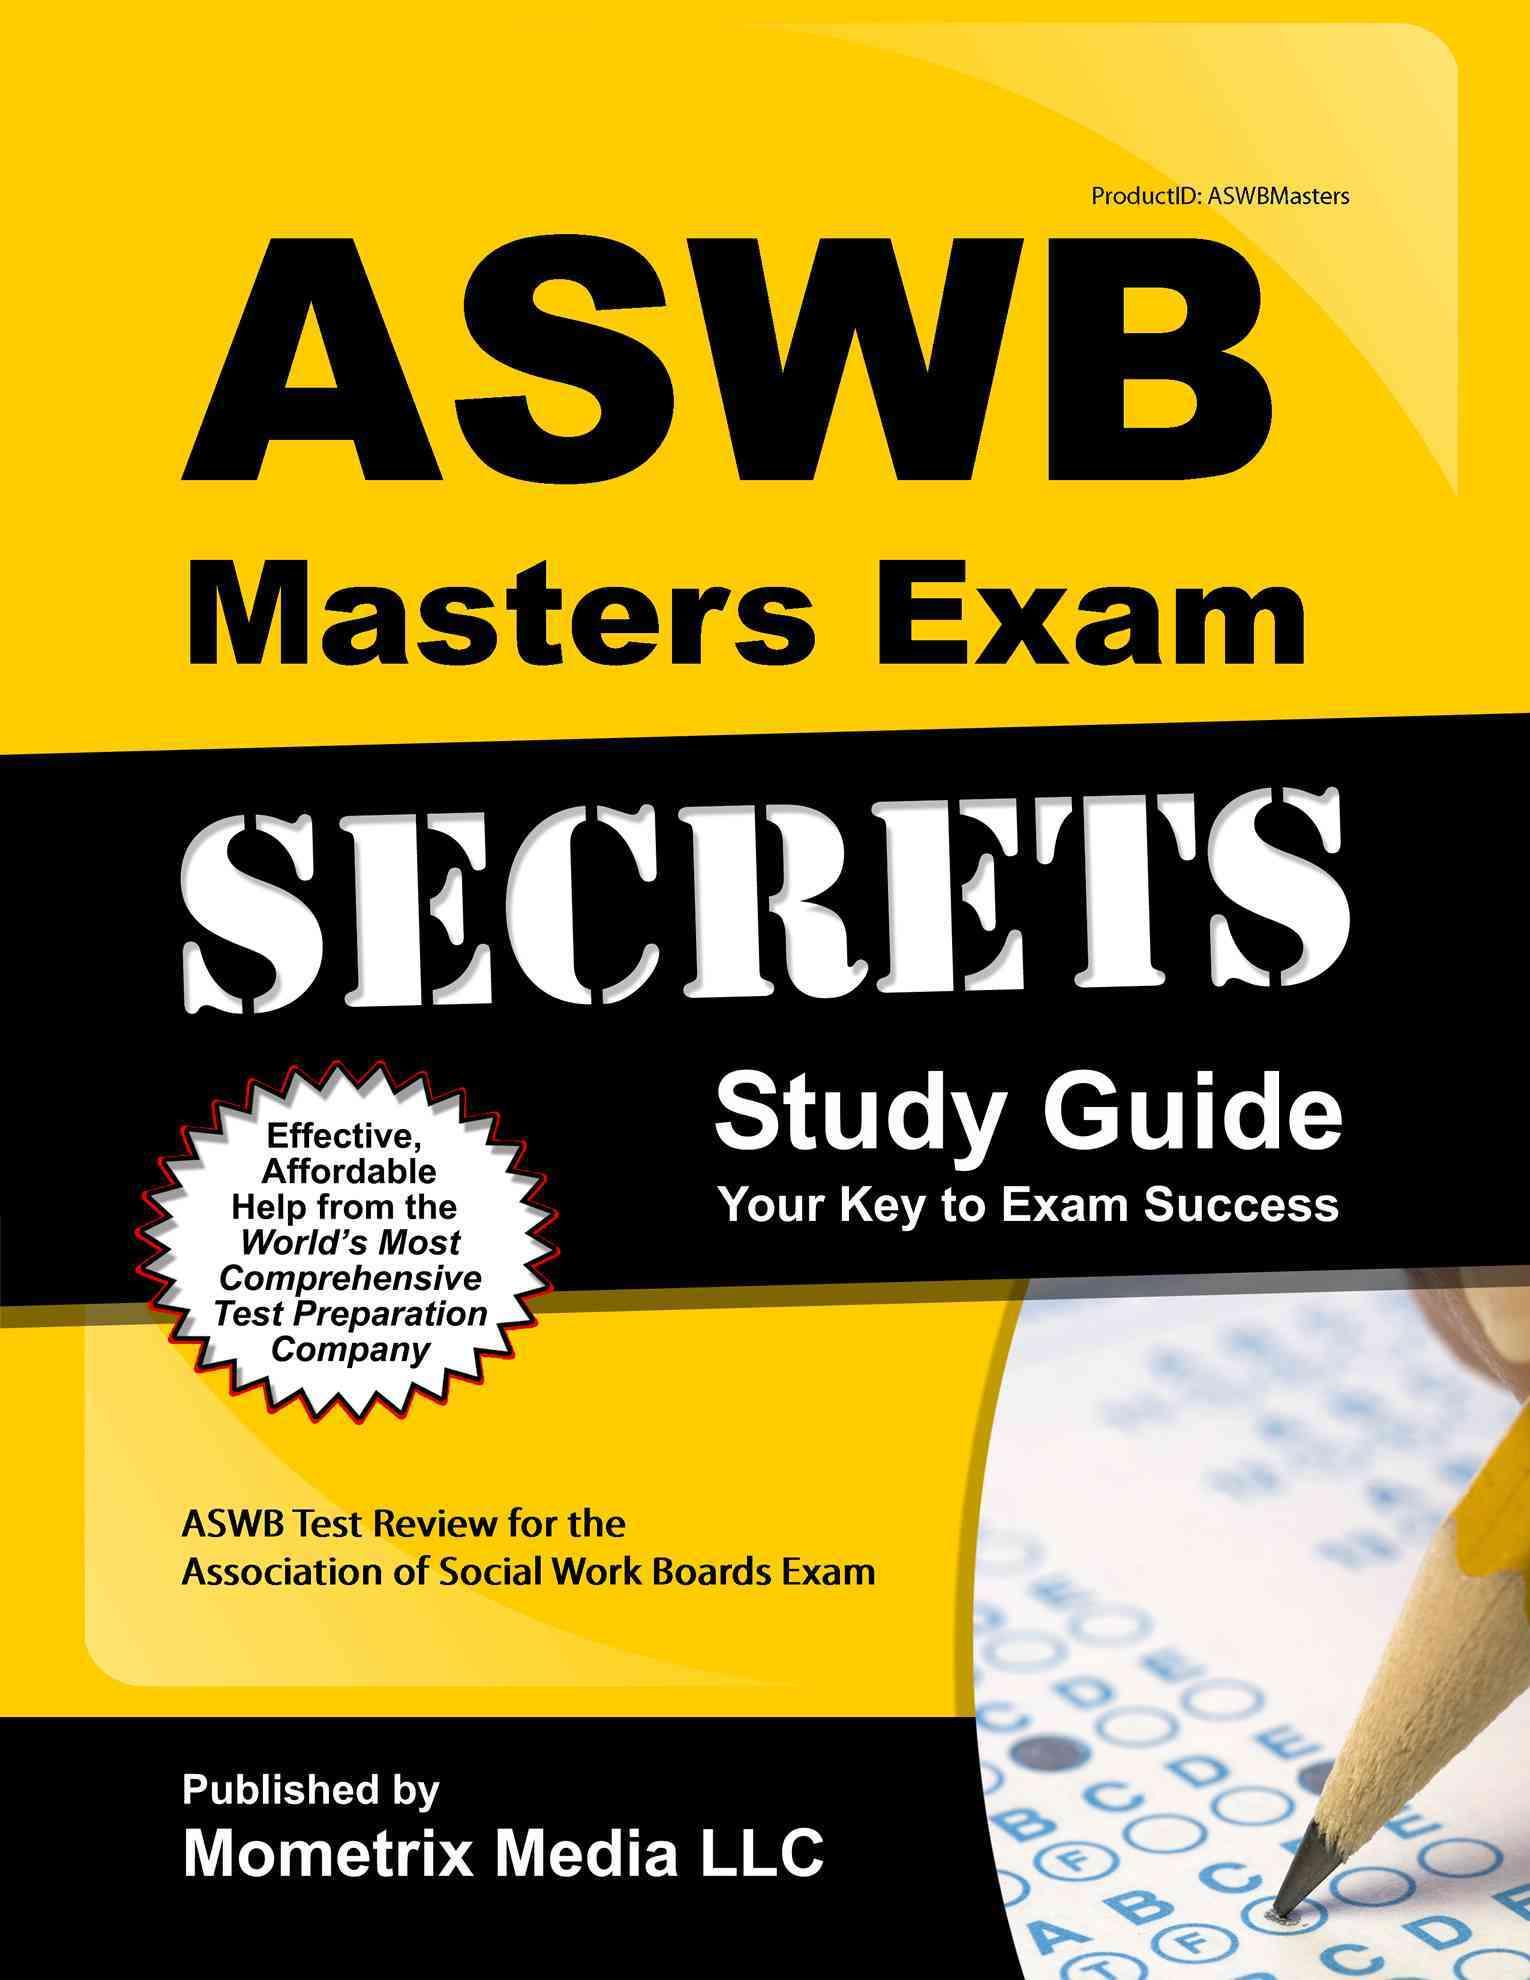 ASWB Masters Exam Secrets By Mometrix Media (COR) [Study Guide Edition]